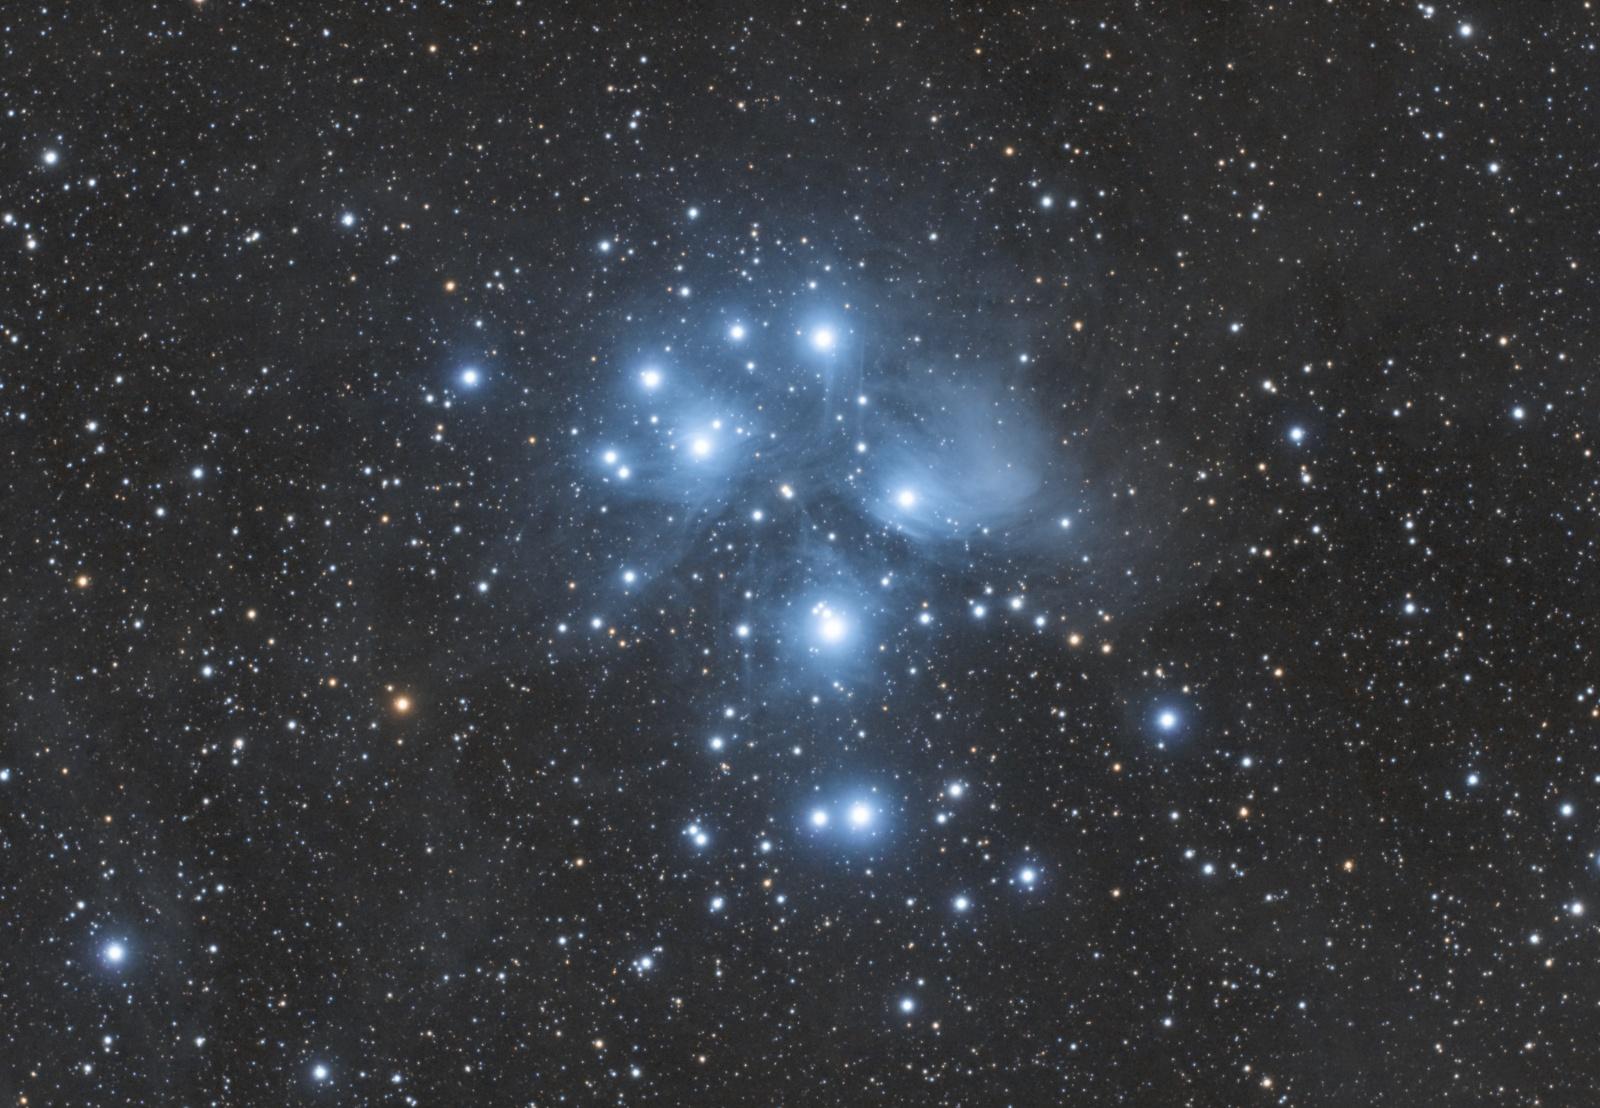 M45-St-v2.thumb.jpg.16cd5d830816234b4e6587d6f01aada3.jpg